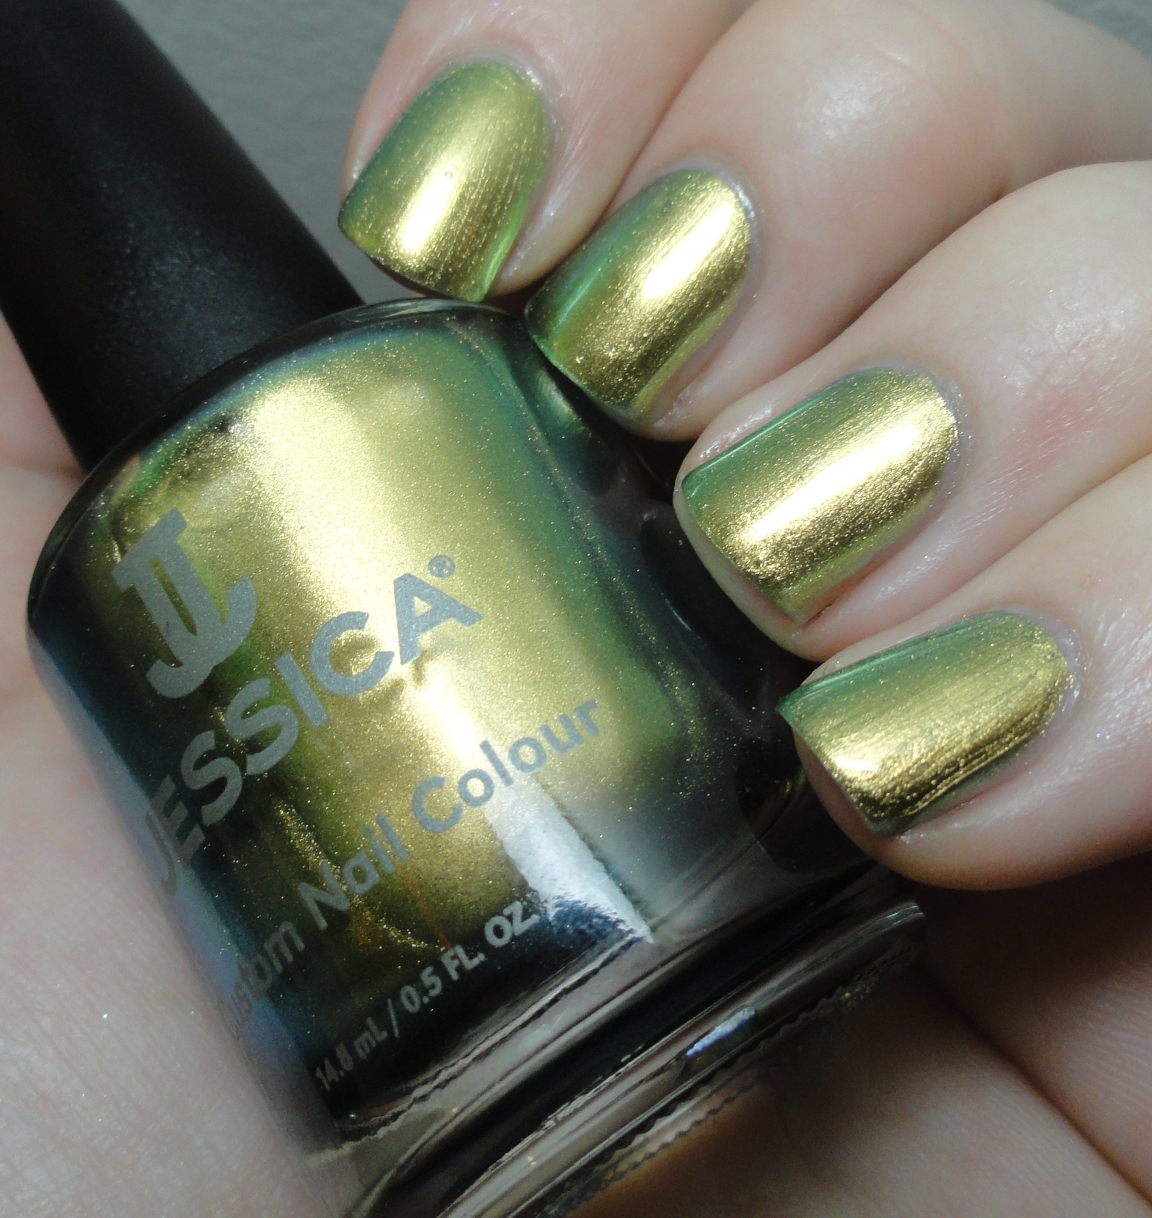 Elemental Styles: Featuring: Jessica Iridescent Eye + Glitter!